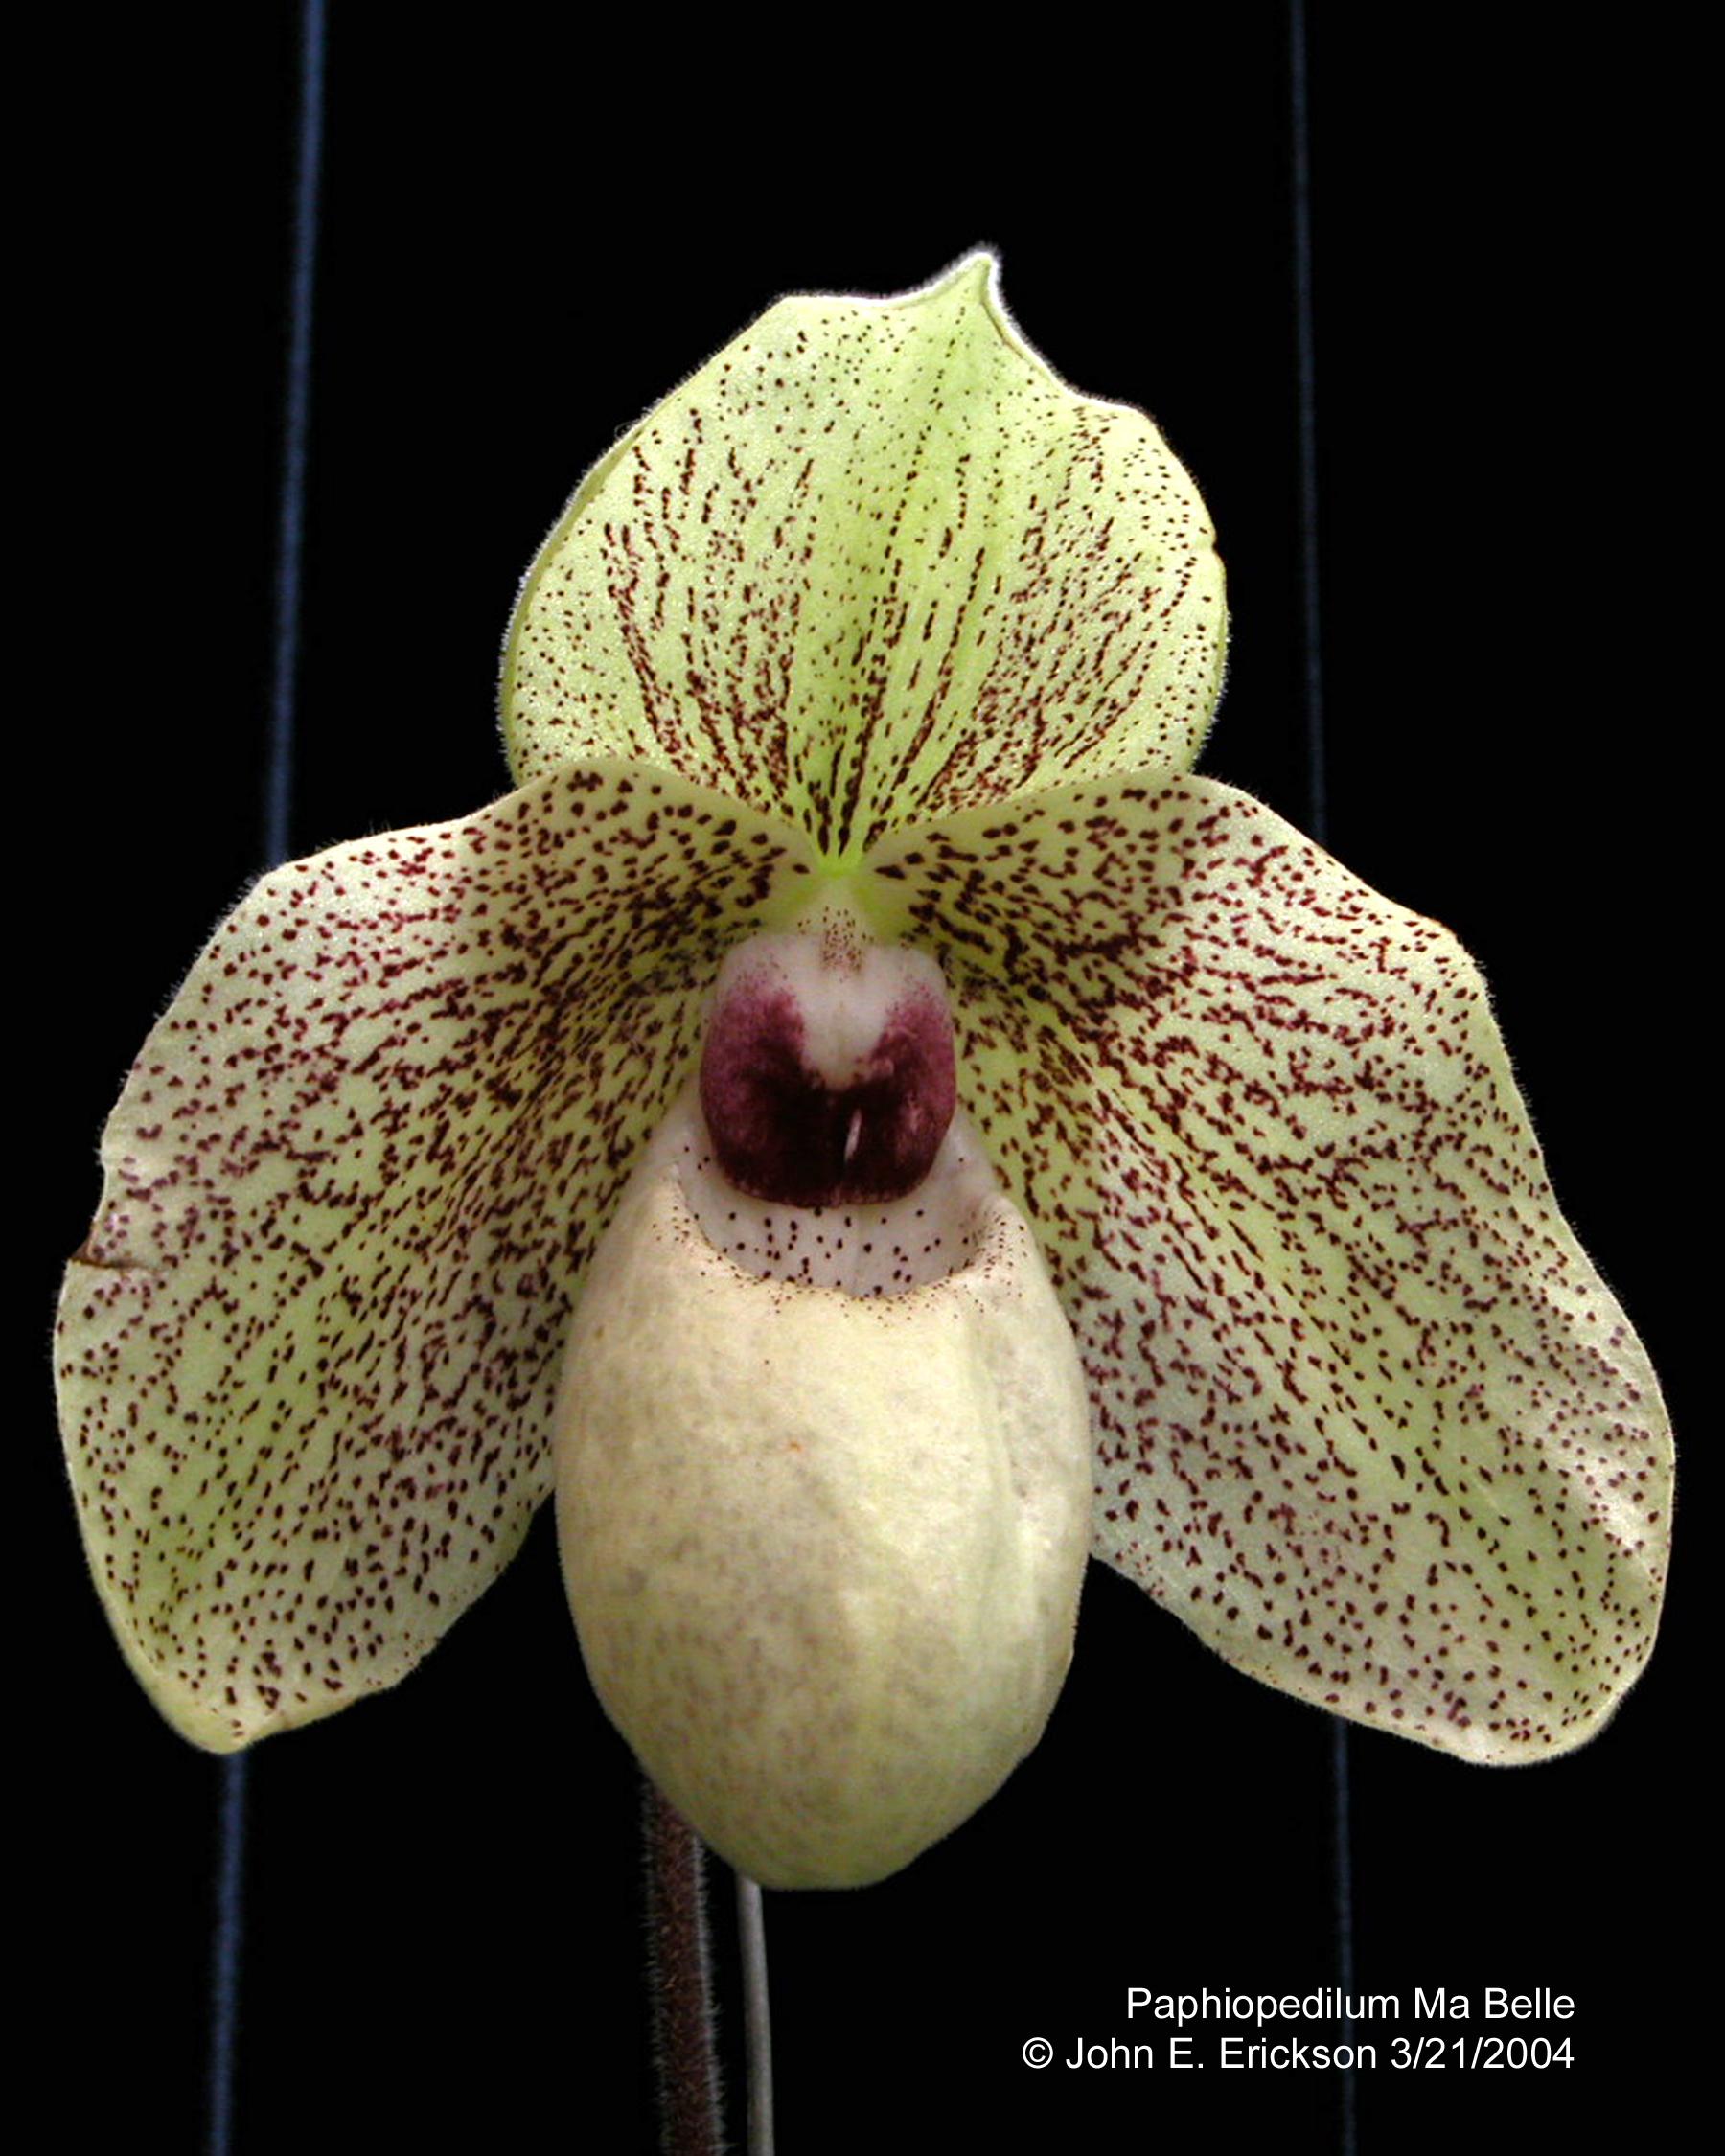 http://orchids.legolas.org/gallery/d/1249-2/Paphiopedilum_Ma_Belle.jpg